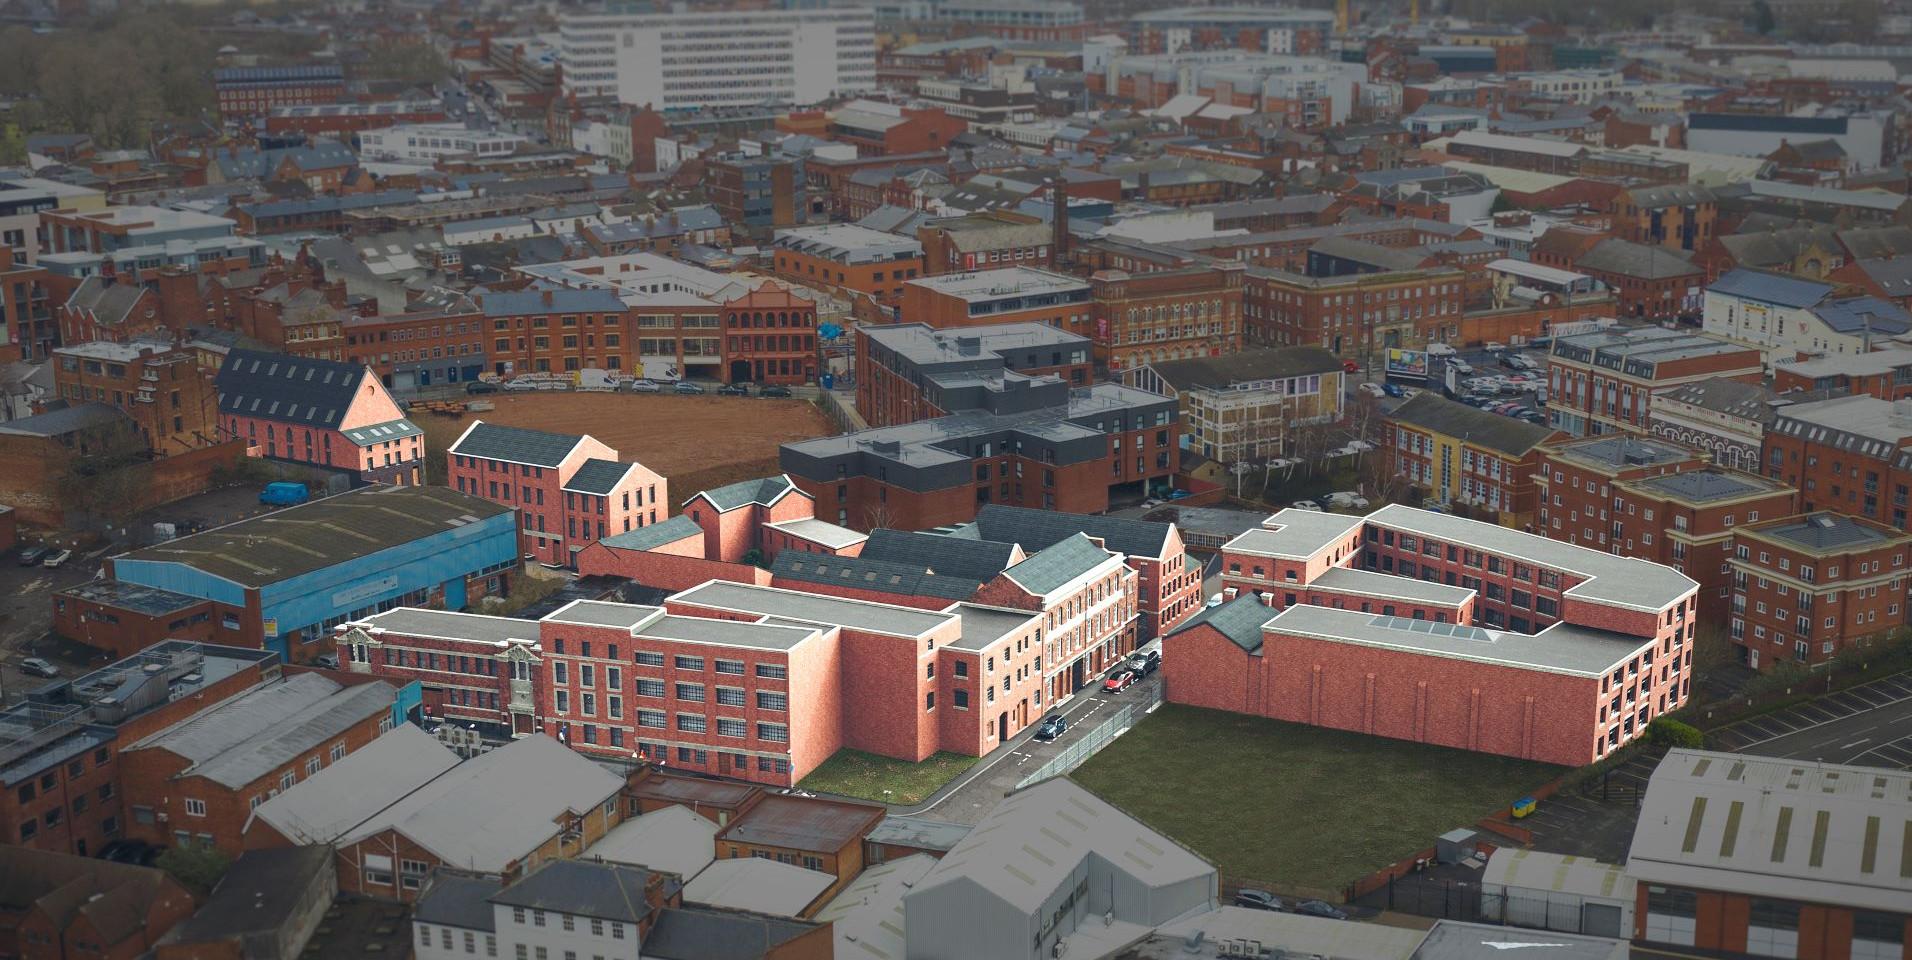 The Copperworks - Birmingham, Jewellery Quarter